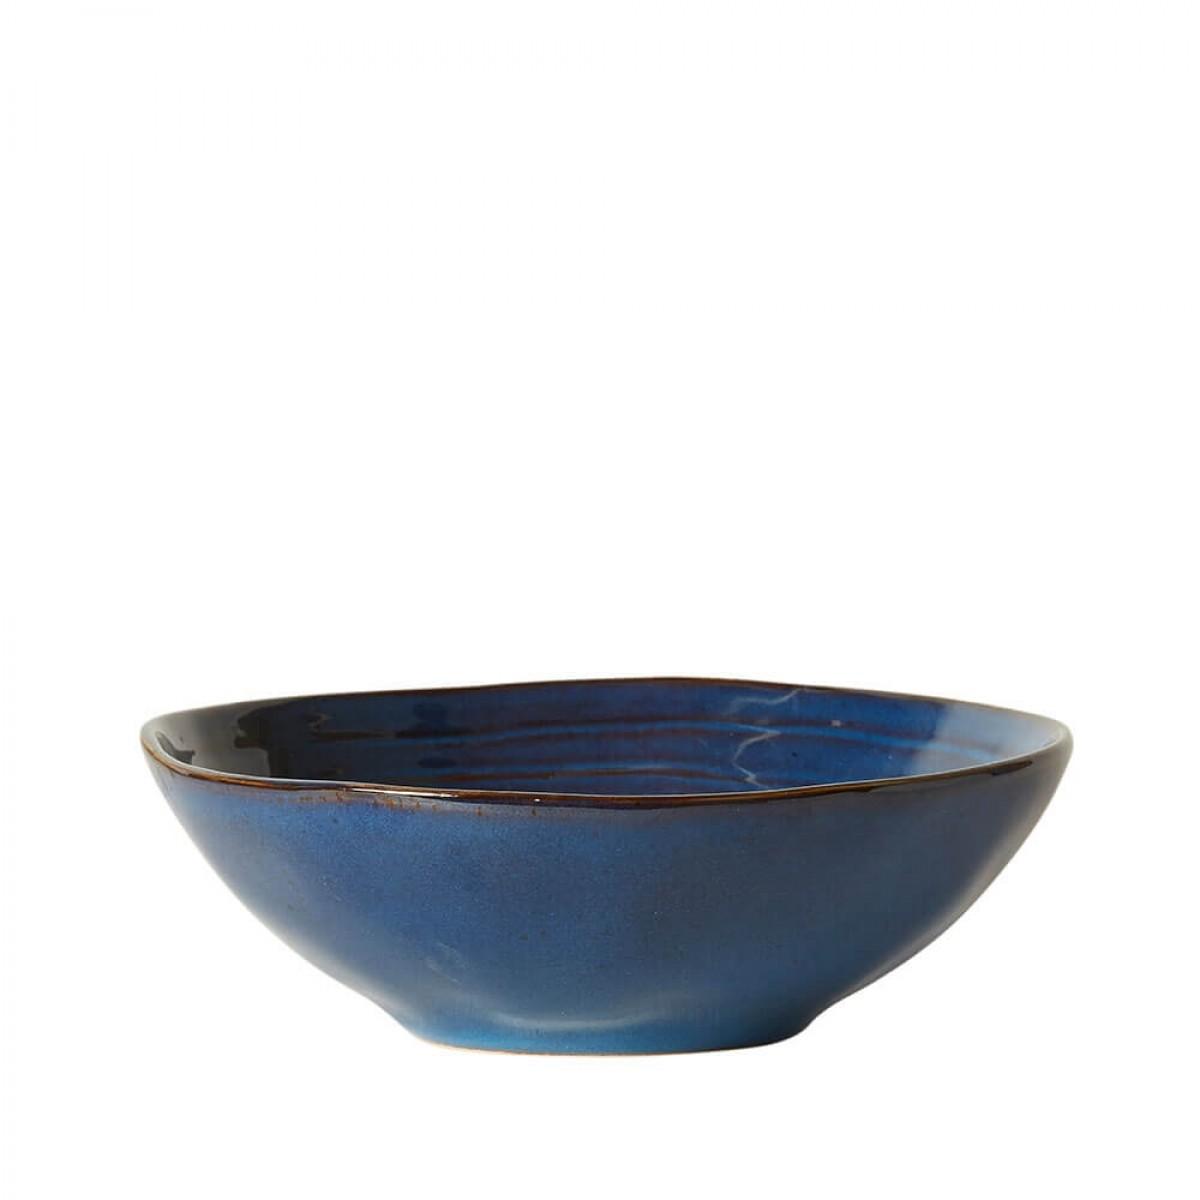 DACORE Skål stentøj 19x6 cm blå